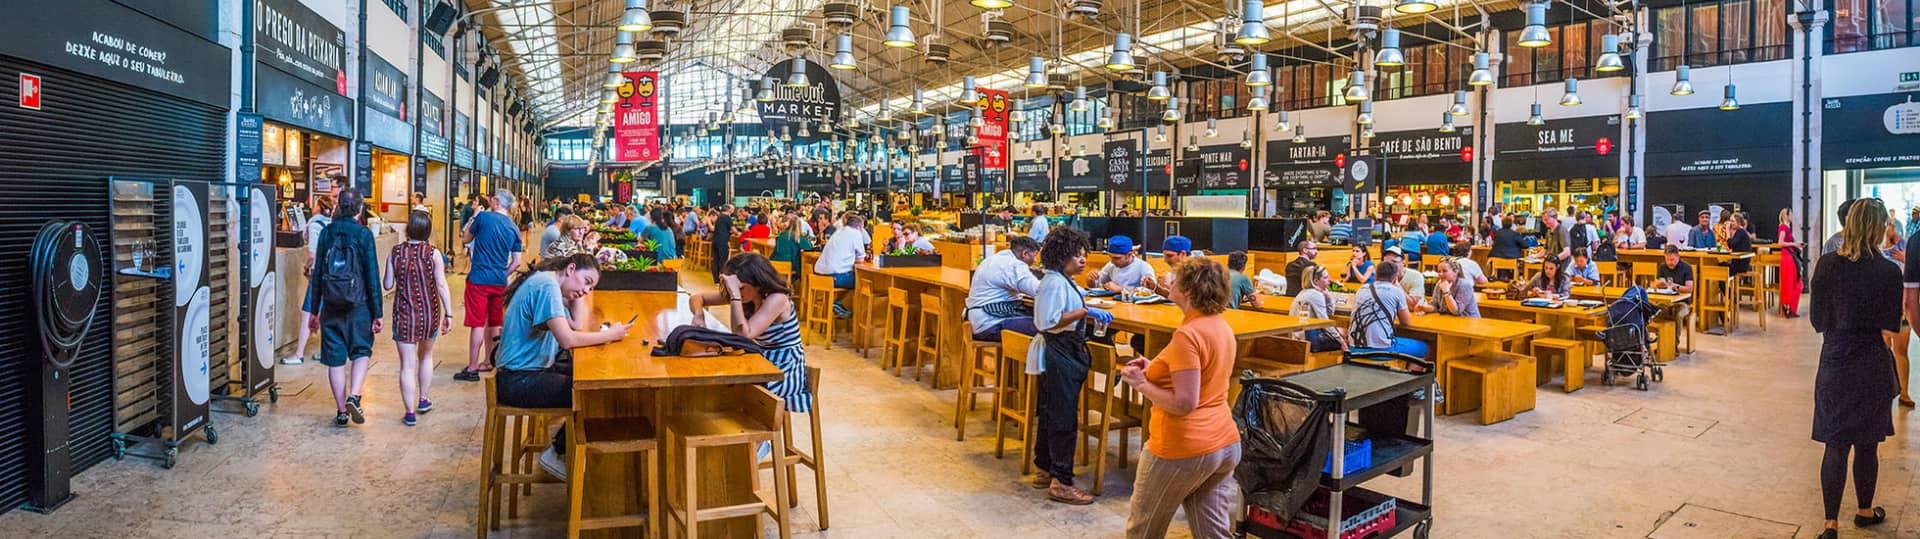 Mercados de Lisboa | Portugal | Portada